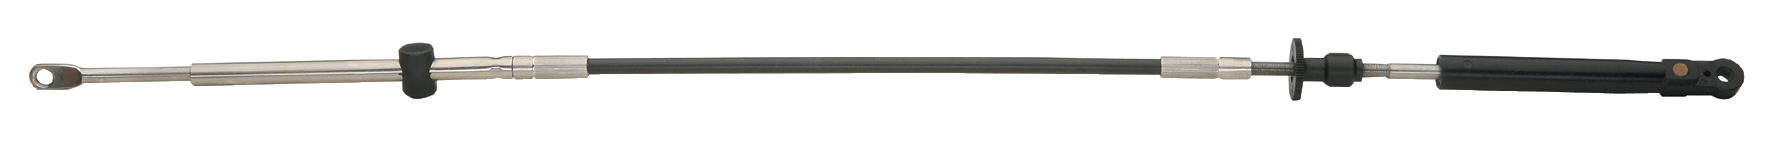 Maxflex reglagekabel omc 13 ft